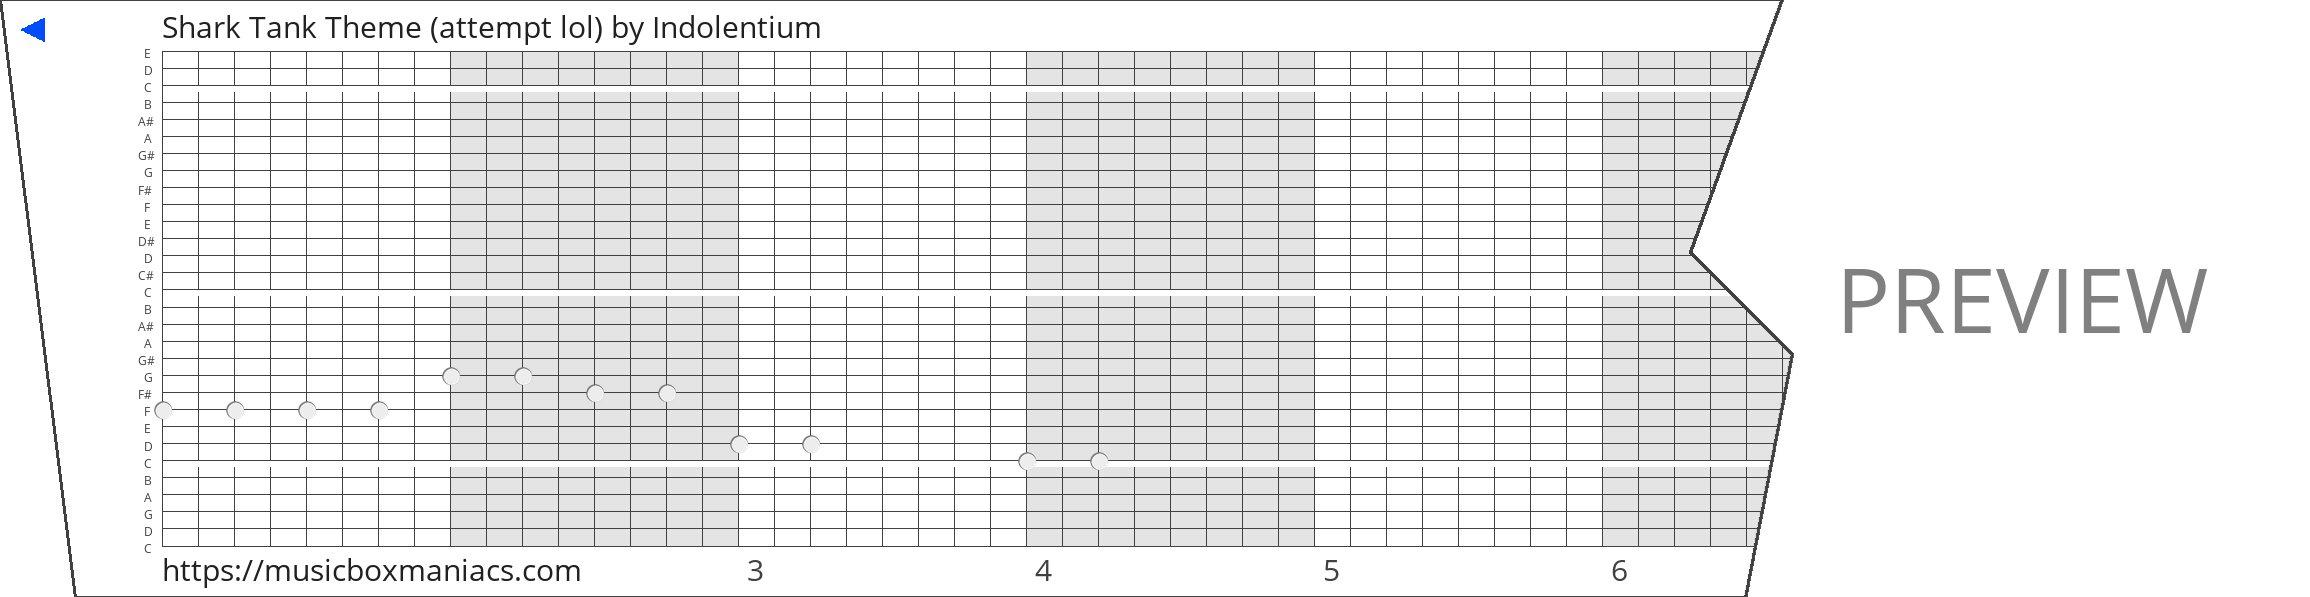 Shark Tank Theme (attempt lol) 30 note music box paper strip